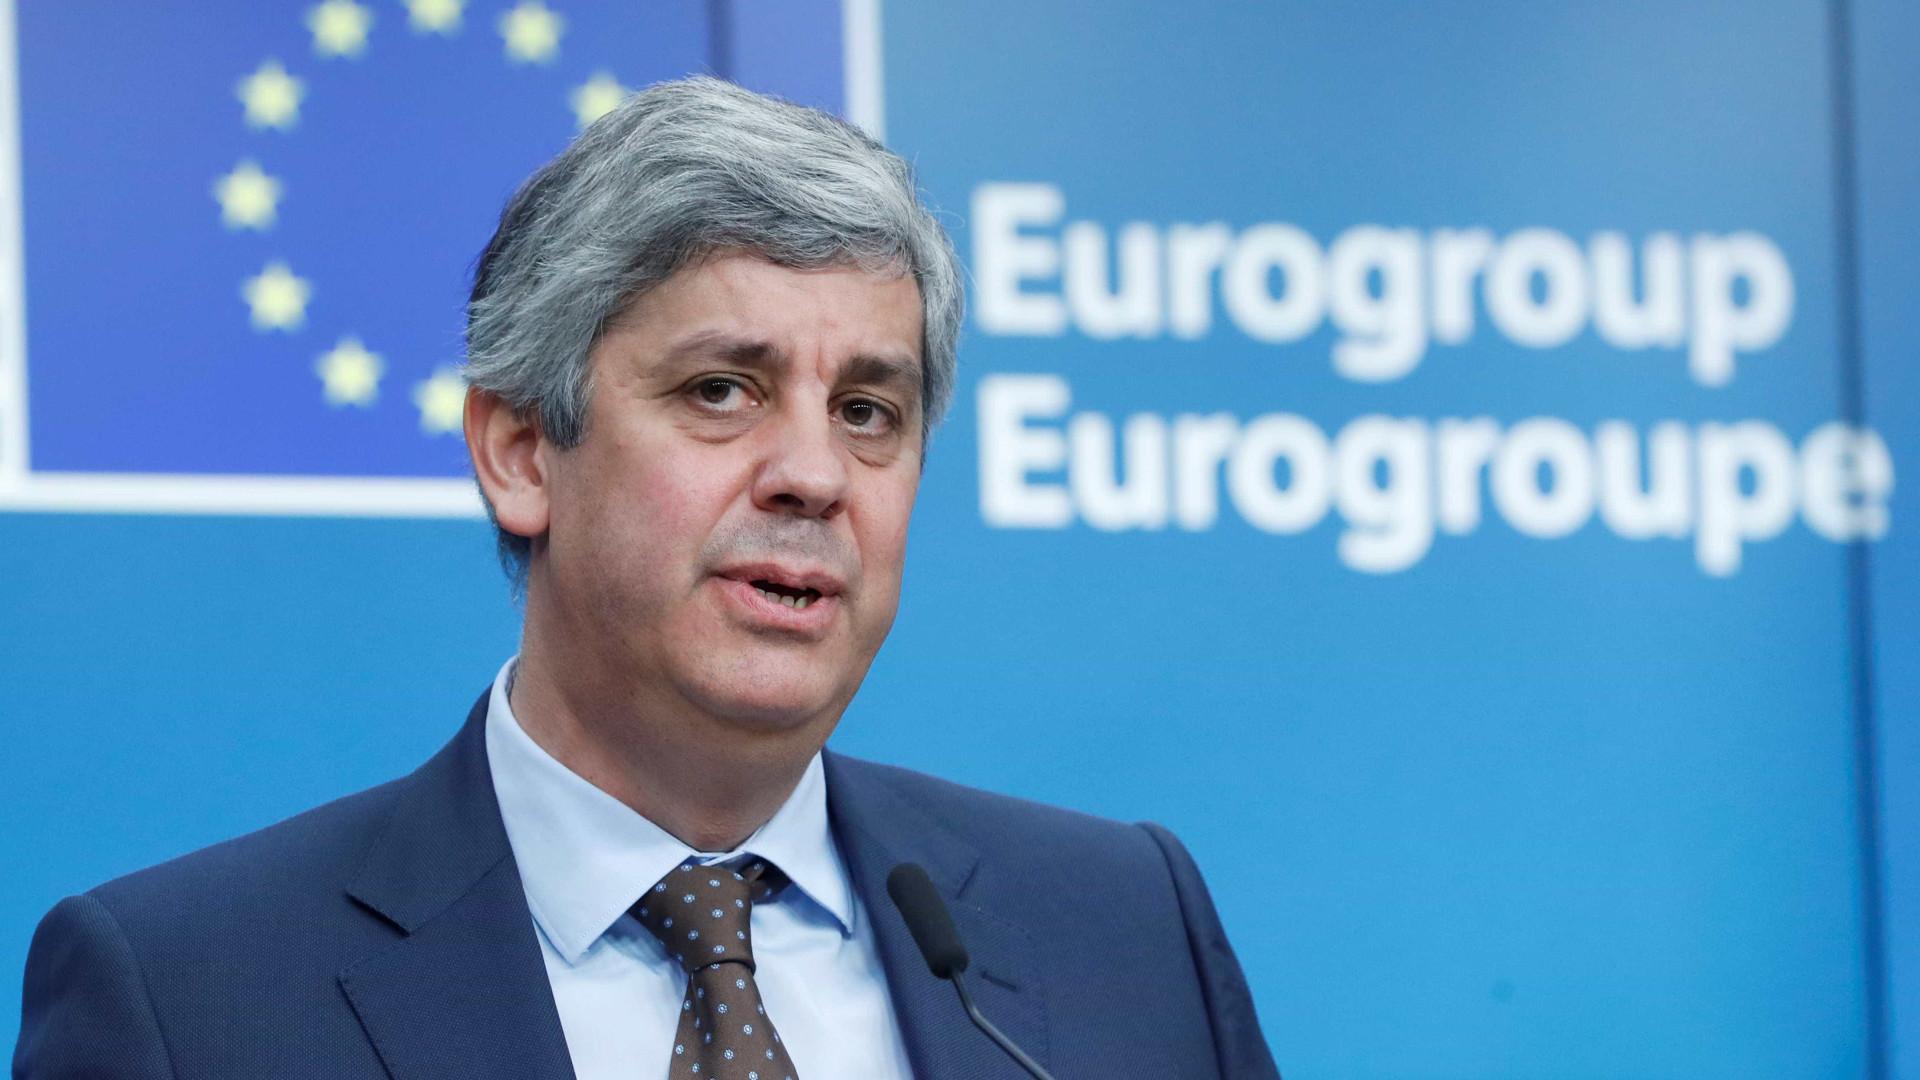 As frases marcantes de Centeno à frente do Eurogrupo